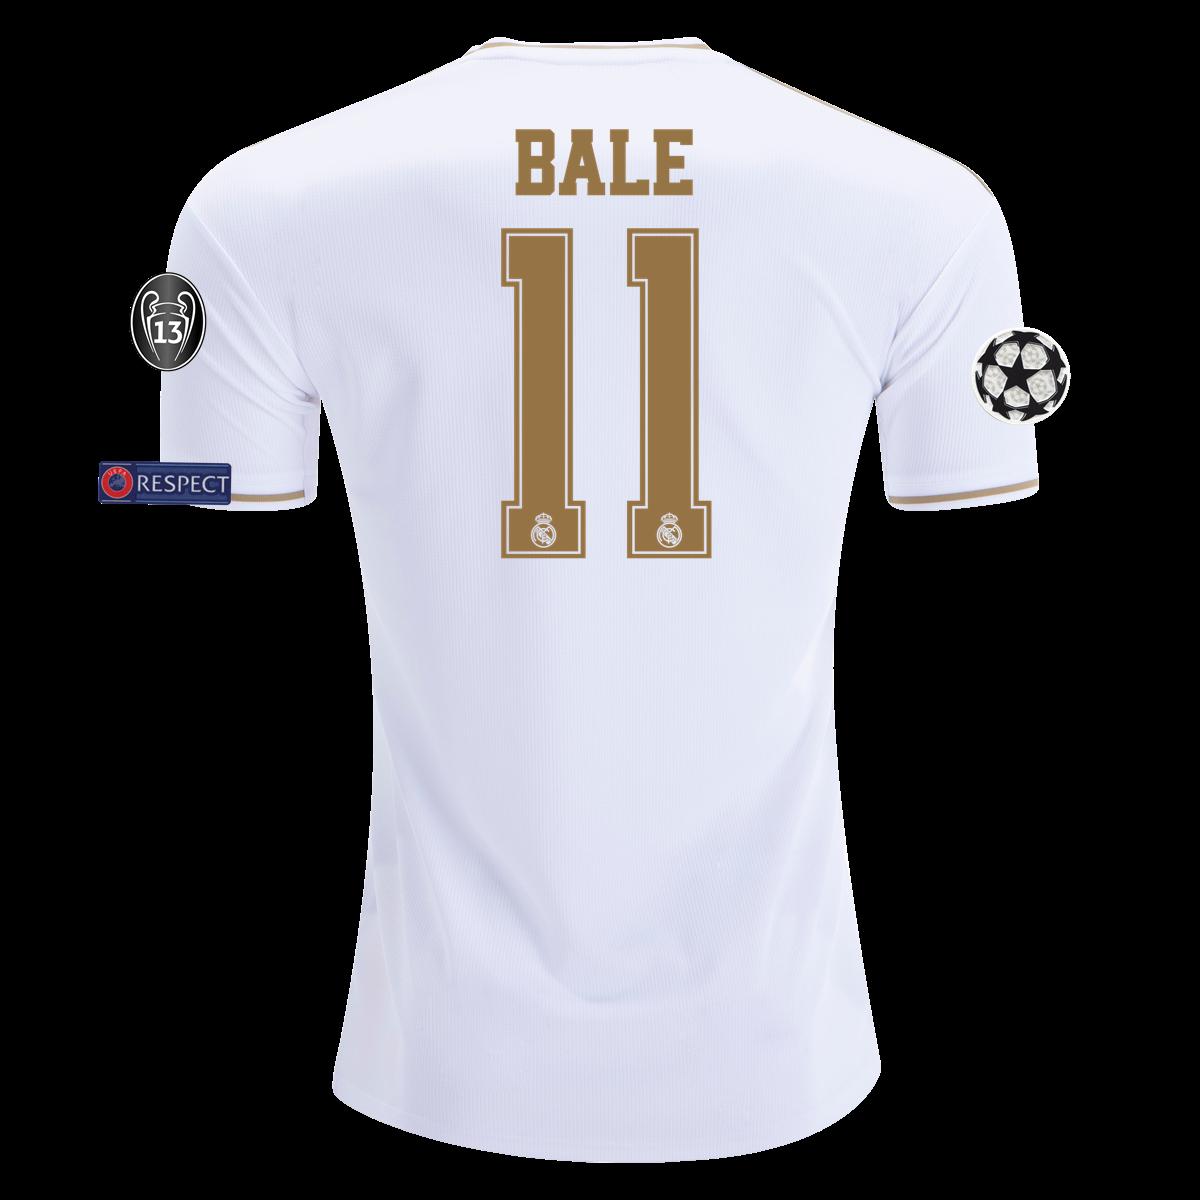 Adidas Gareth Bale Real Madrid Home Jersey 19 20 Xl Bale Real Real Madrid Gareth Bale